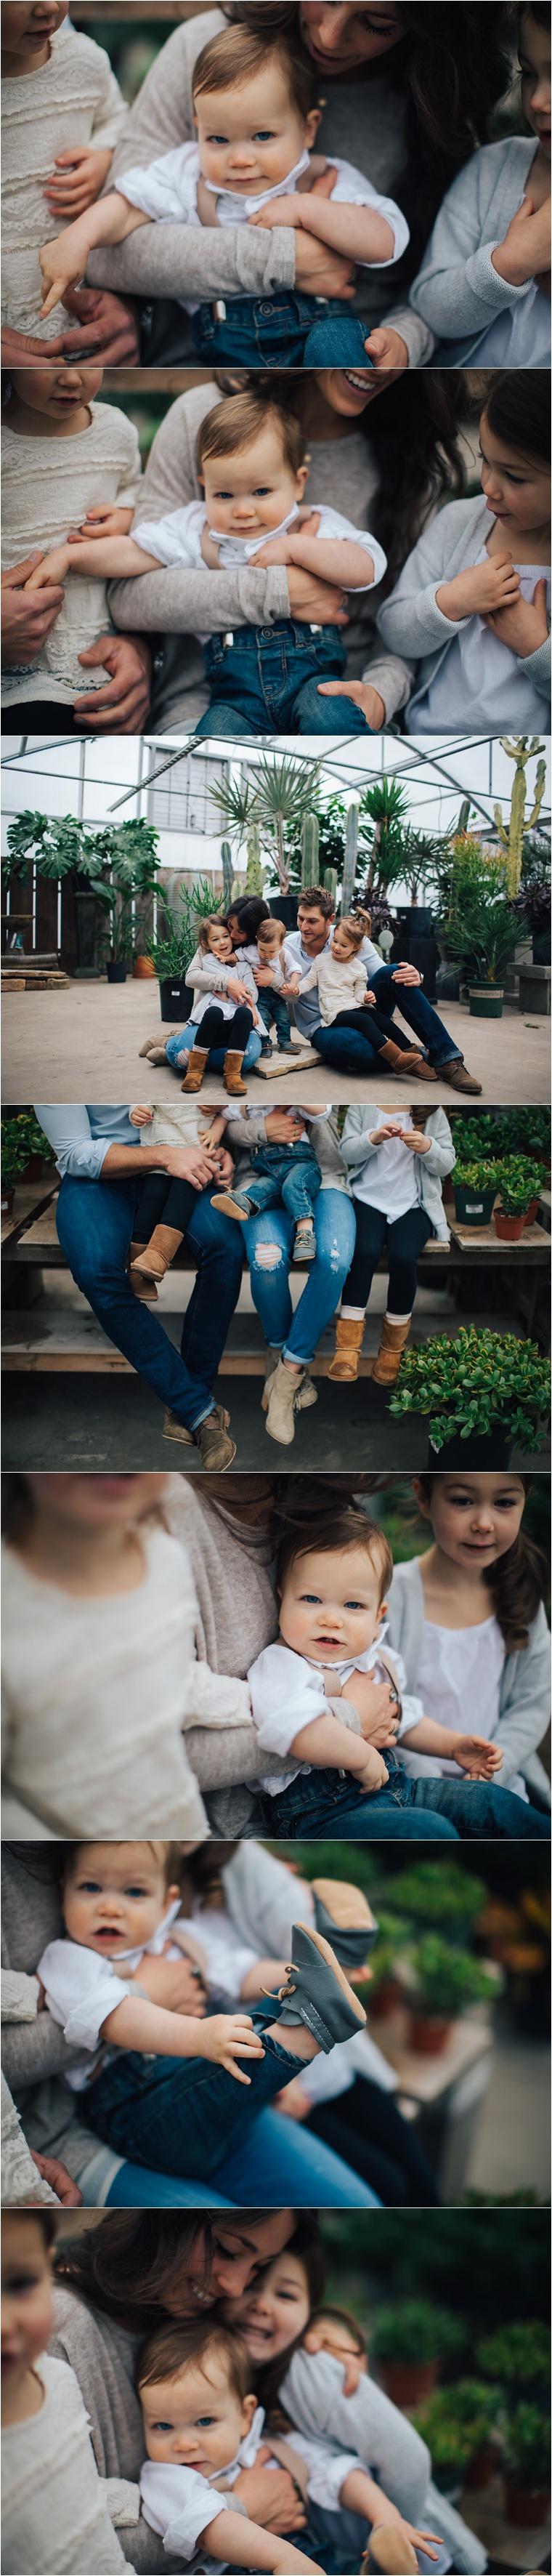 kansascityfamilyphotographer_0111